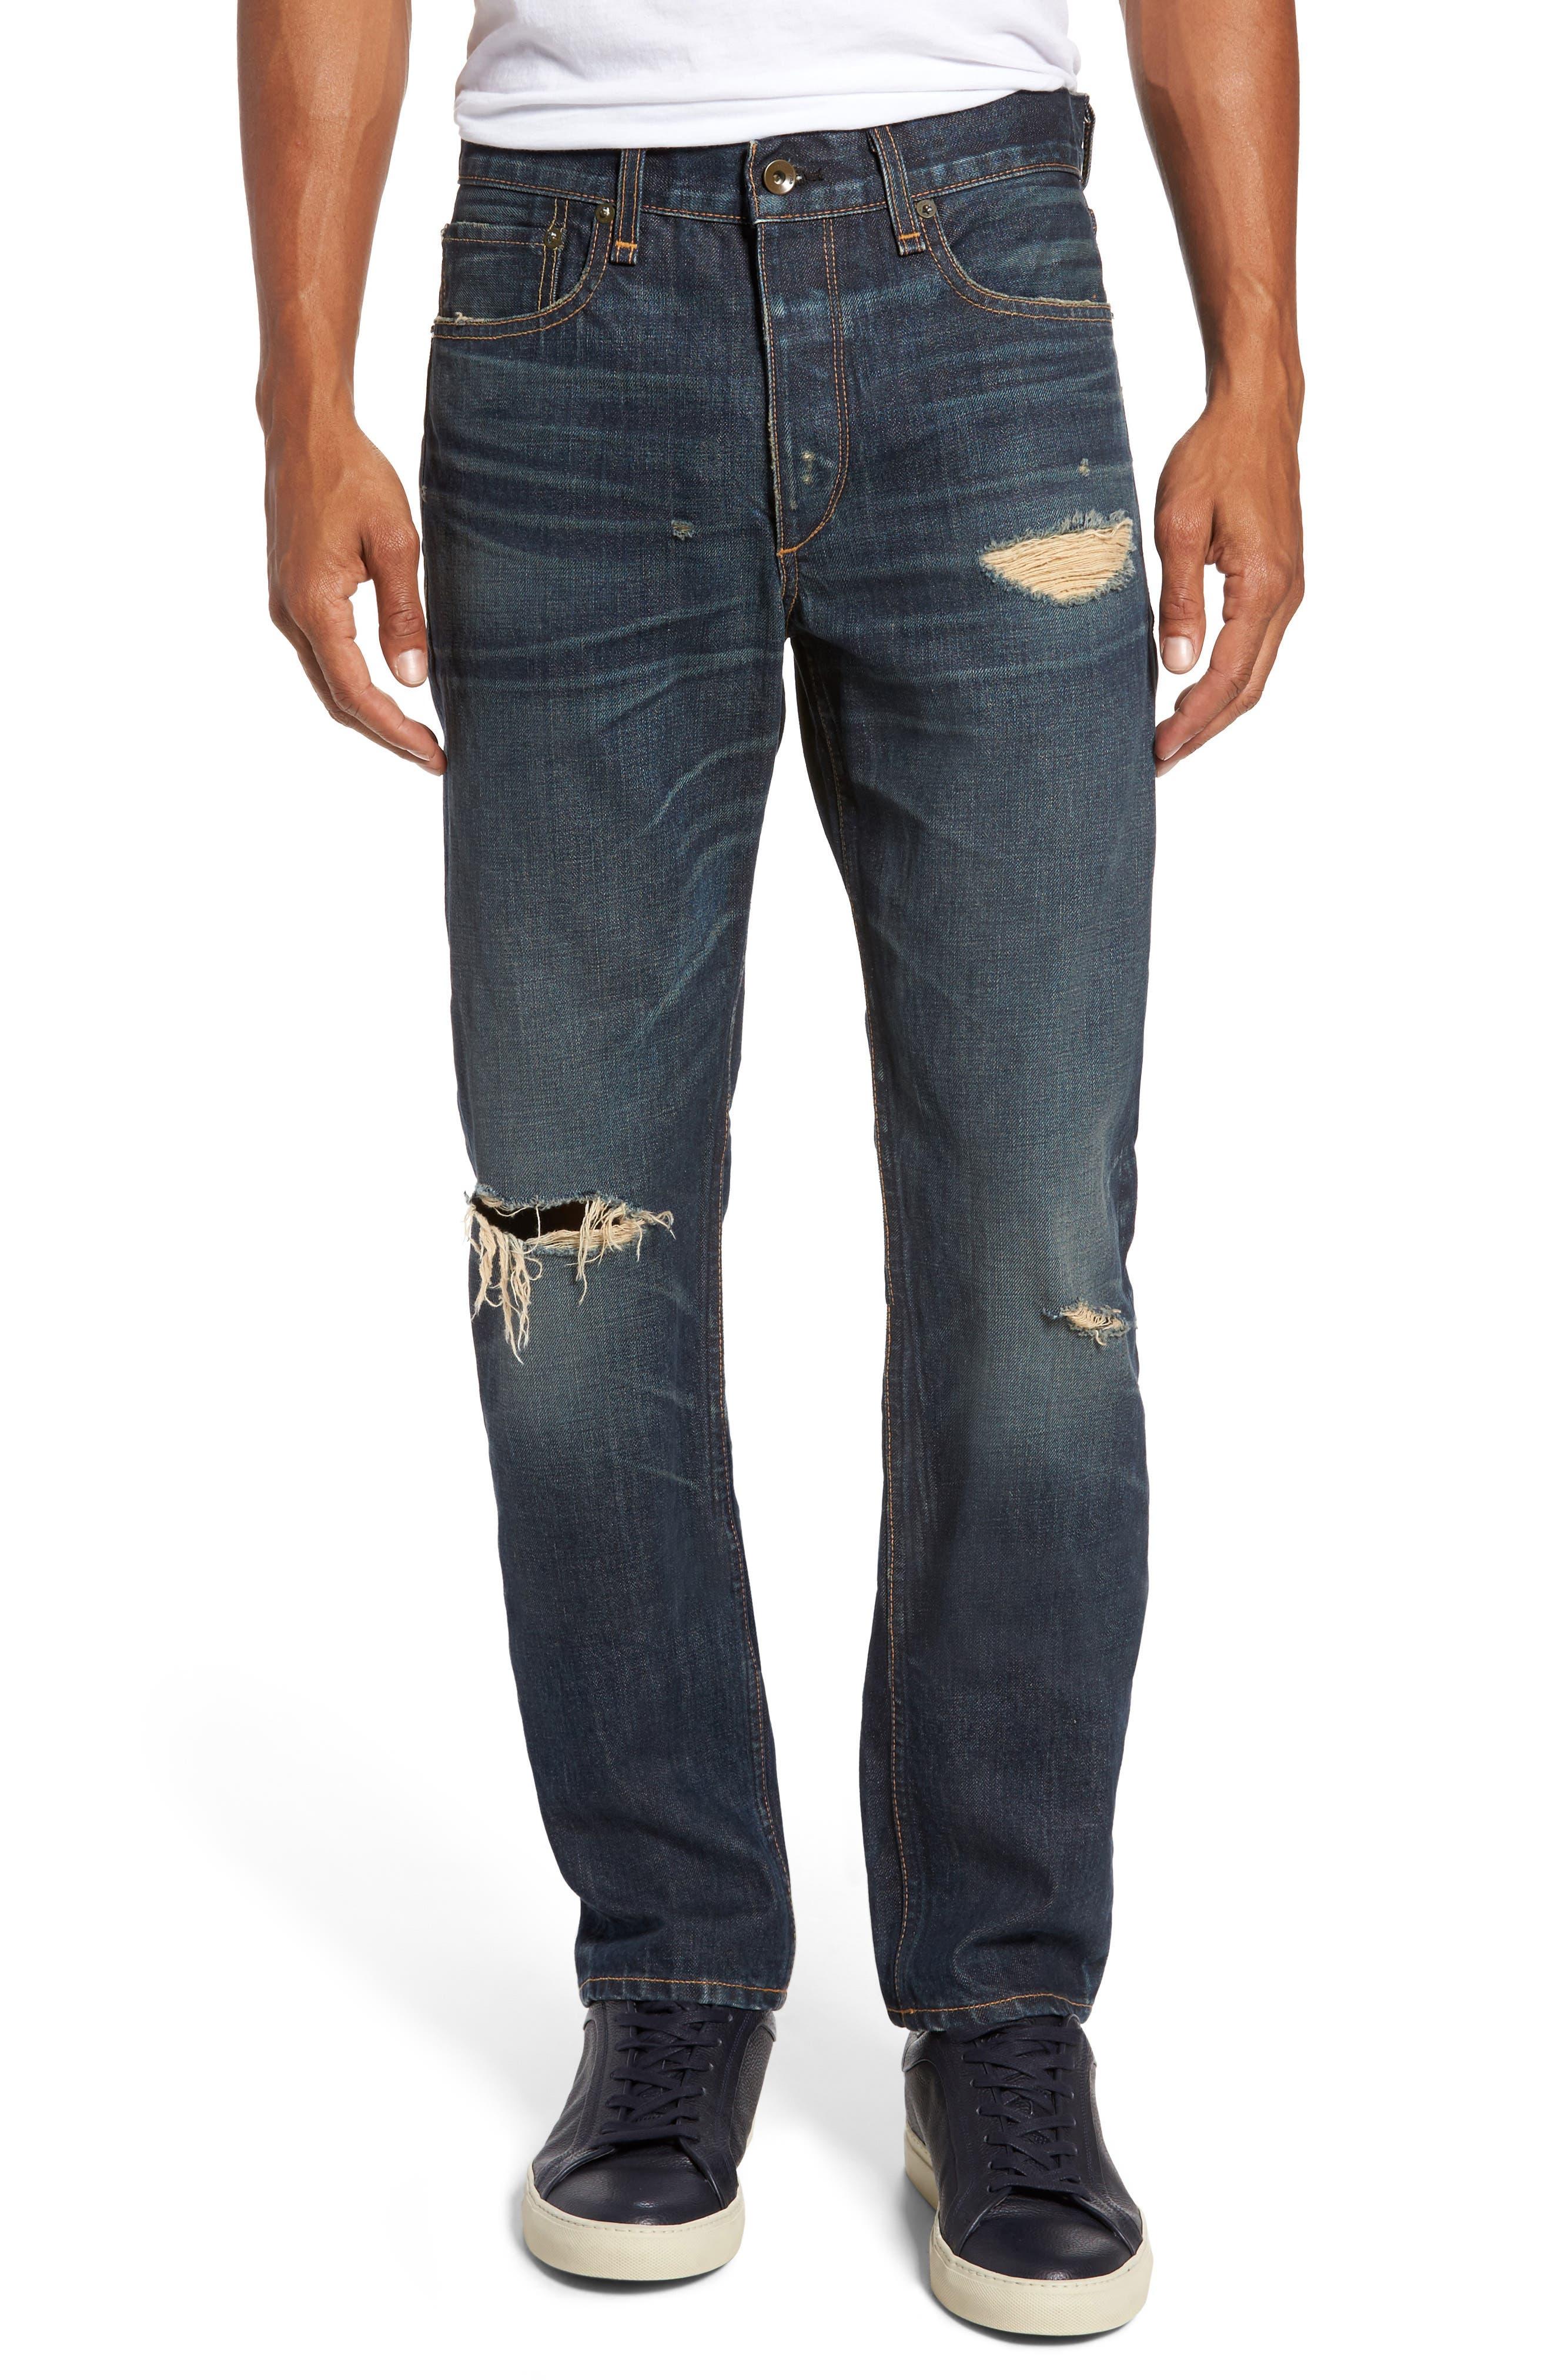 Alternate Image 1 Selected - rag & bone Fit 2 Slim Fit Jeans (Zeitgeist)